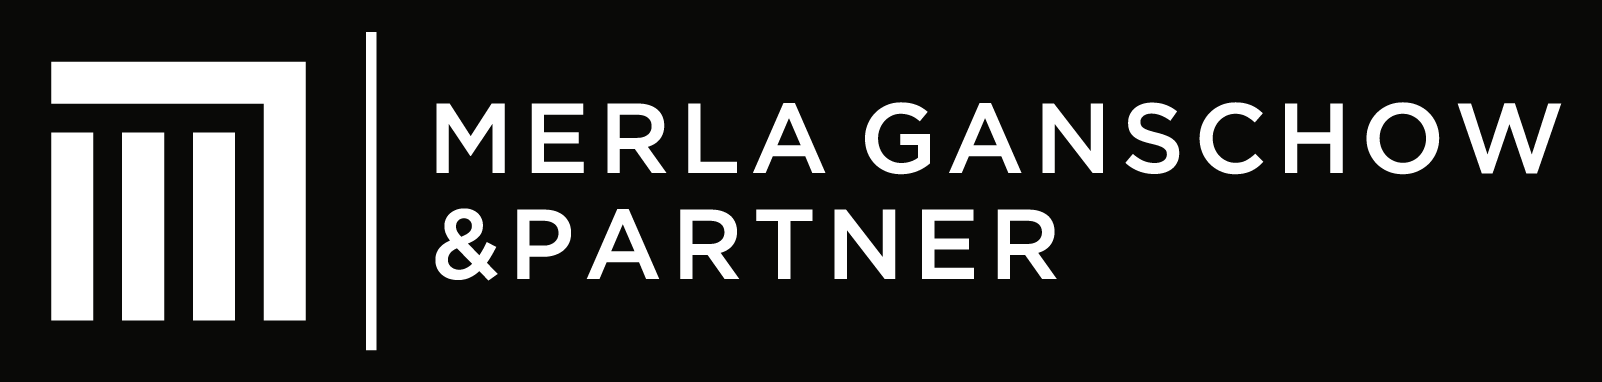 Merla Ganschow & Partner mbB Steuerberater Rechtsanwalt